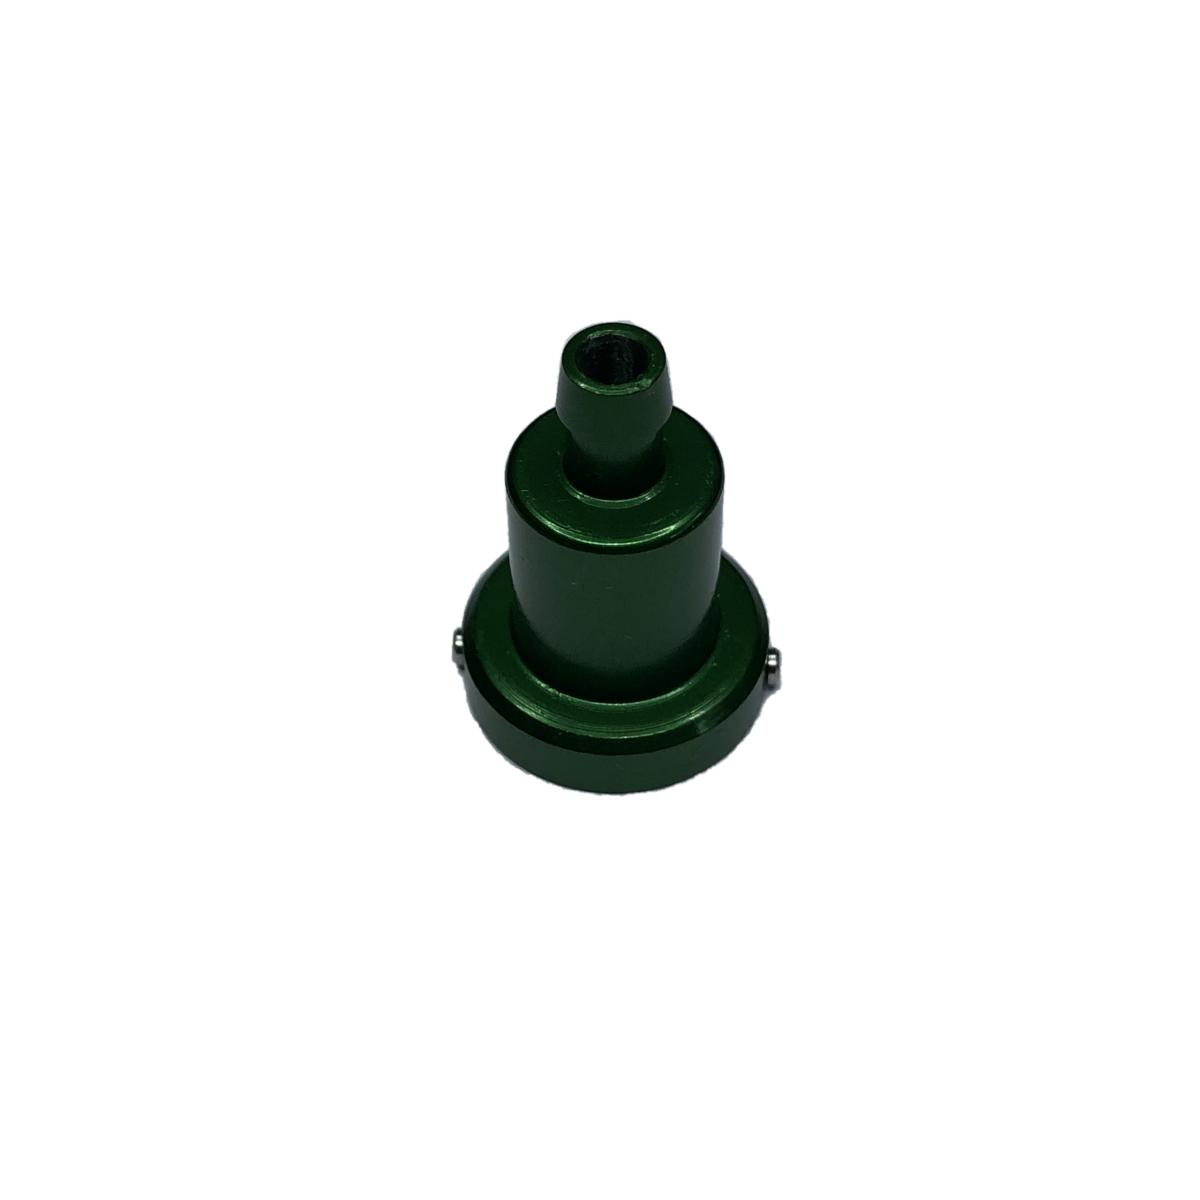 Conector para Teste de Vazamento para Equipamentos Fujinon